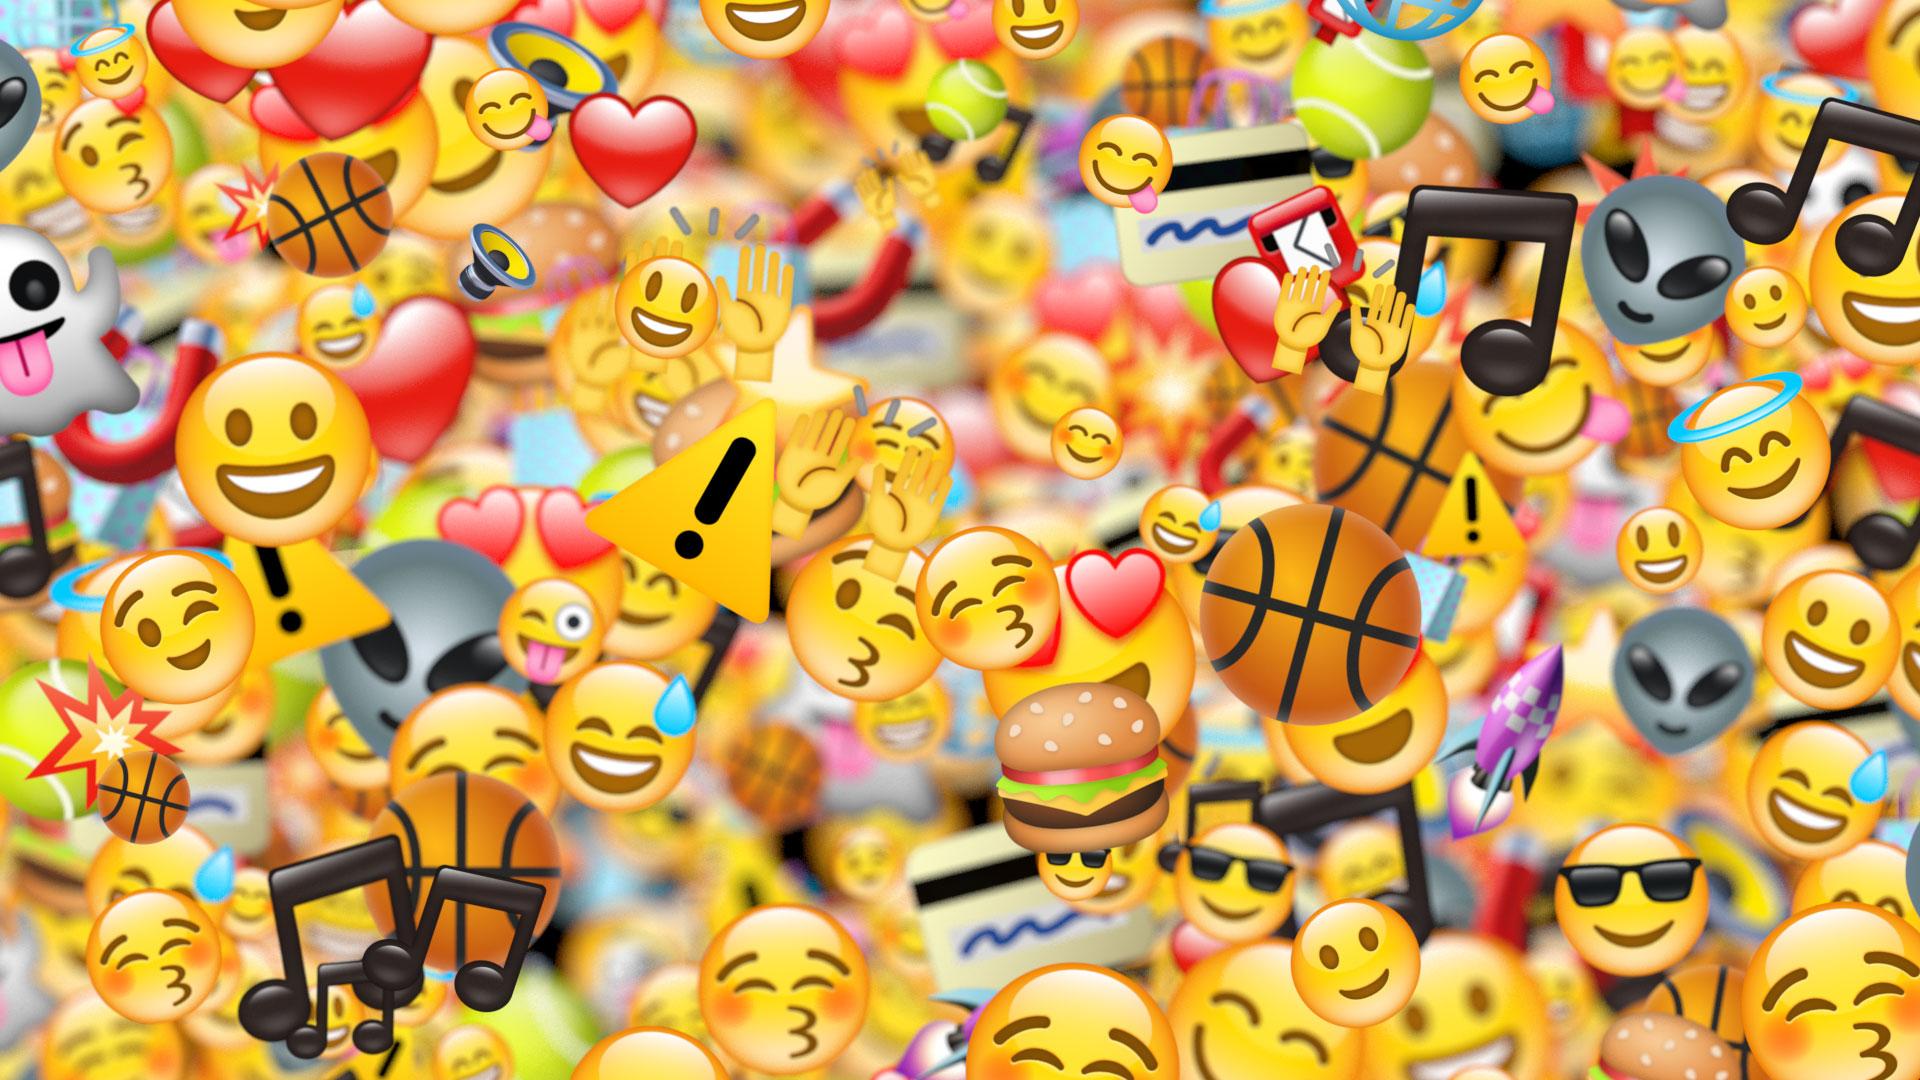 EmojiWall0302Main_201906181525